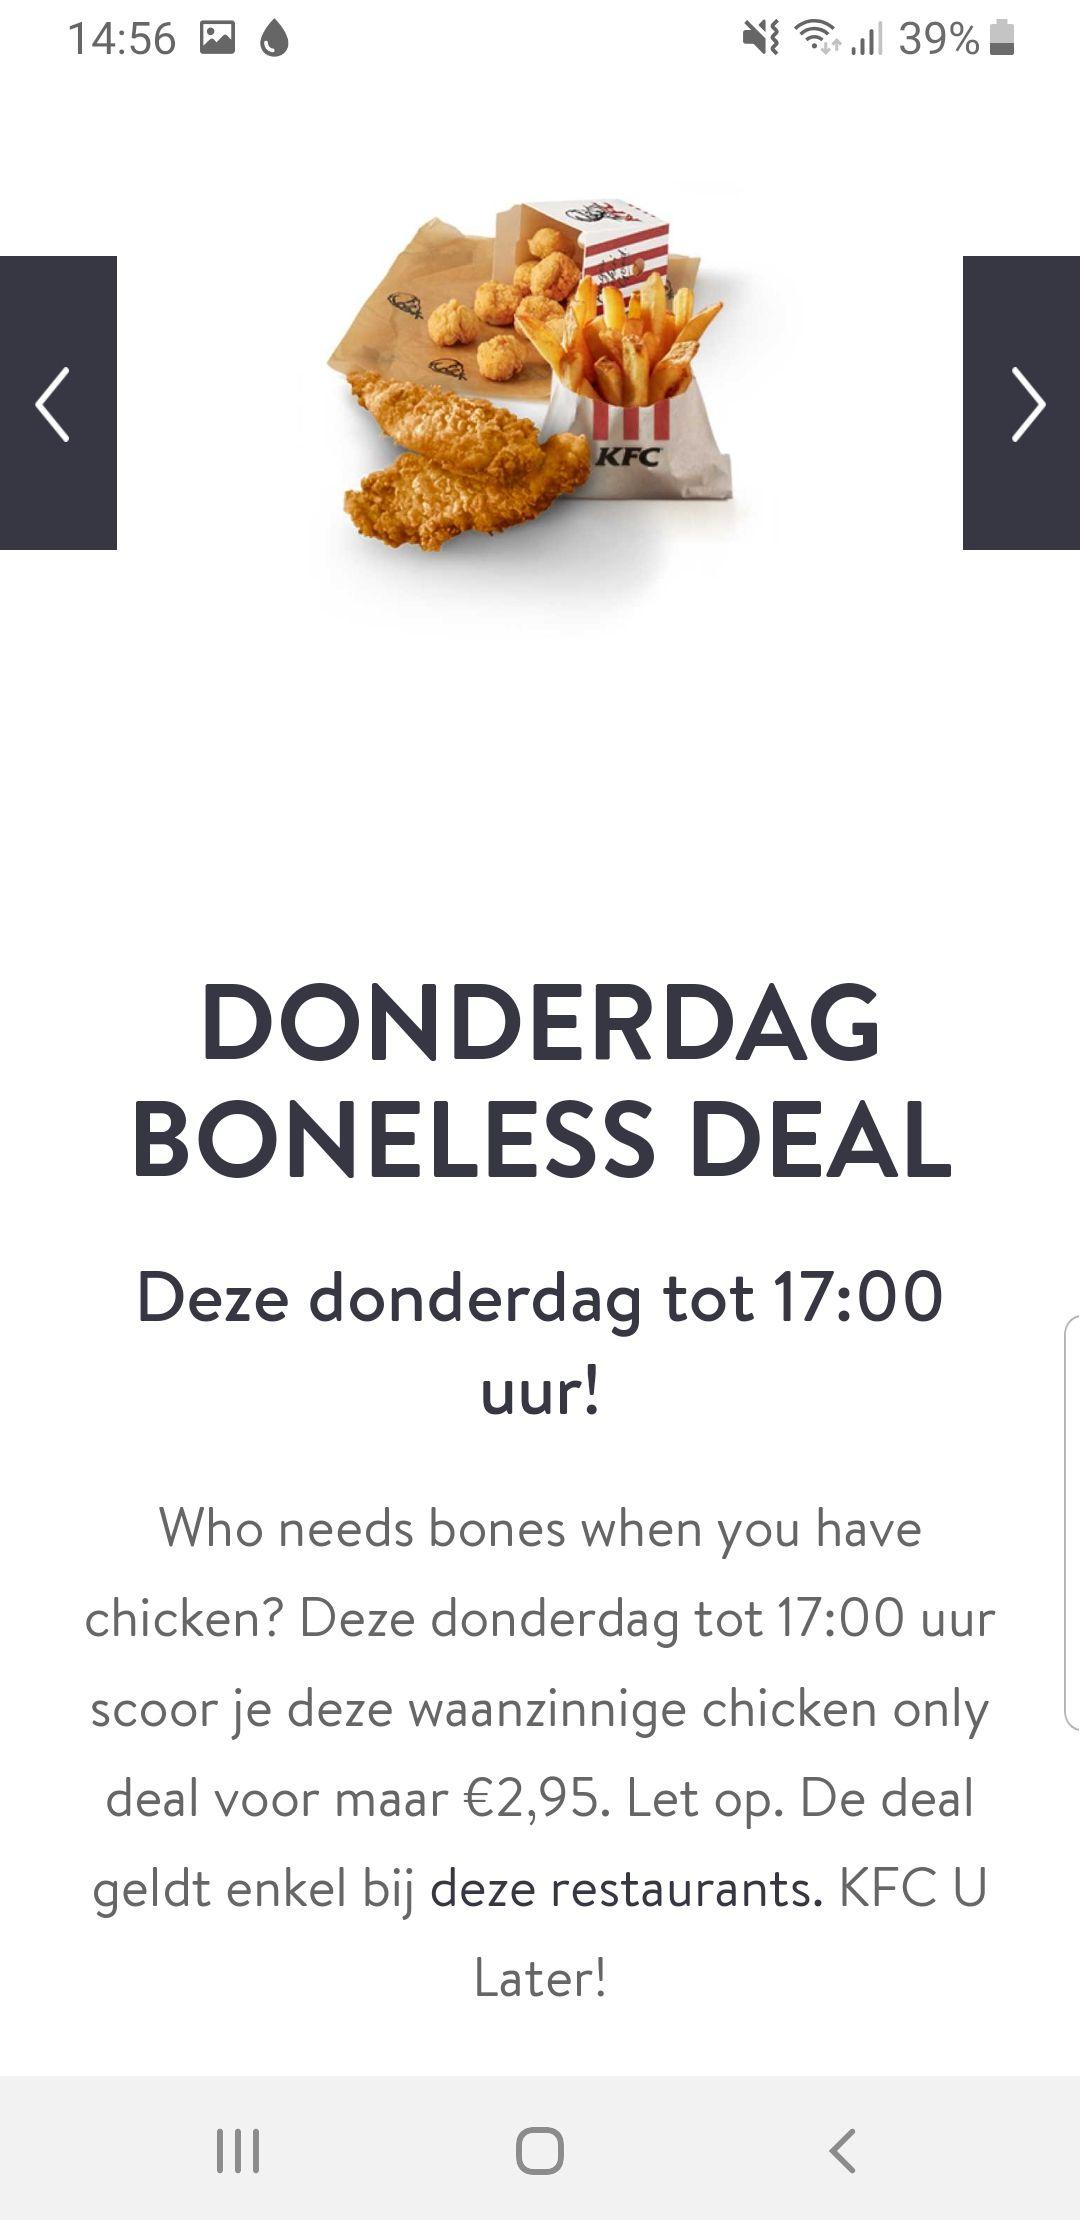 KFC Donderdag Boneless deal